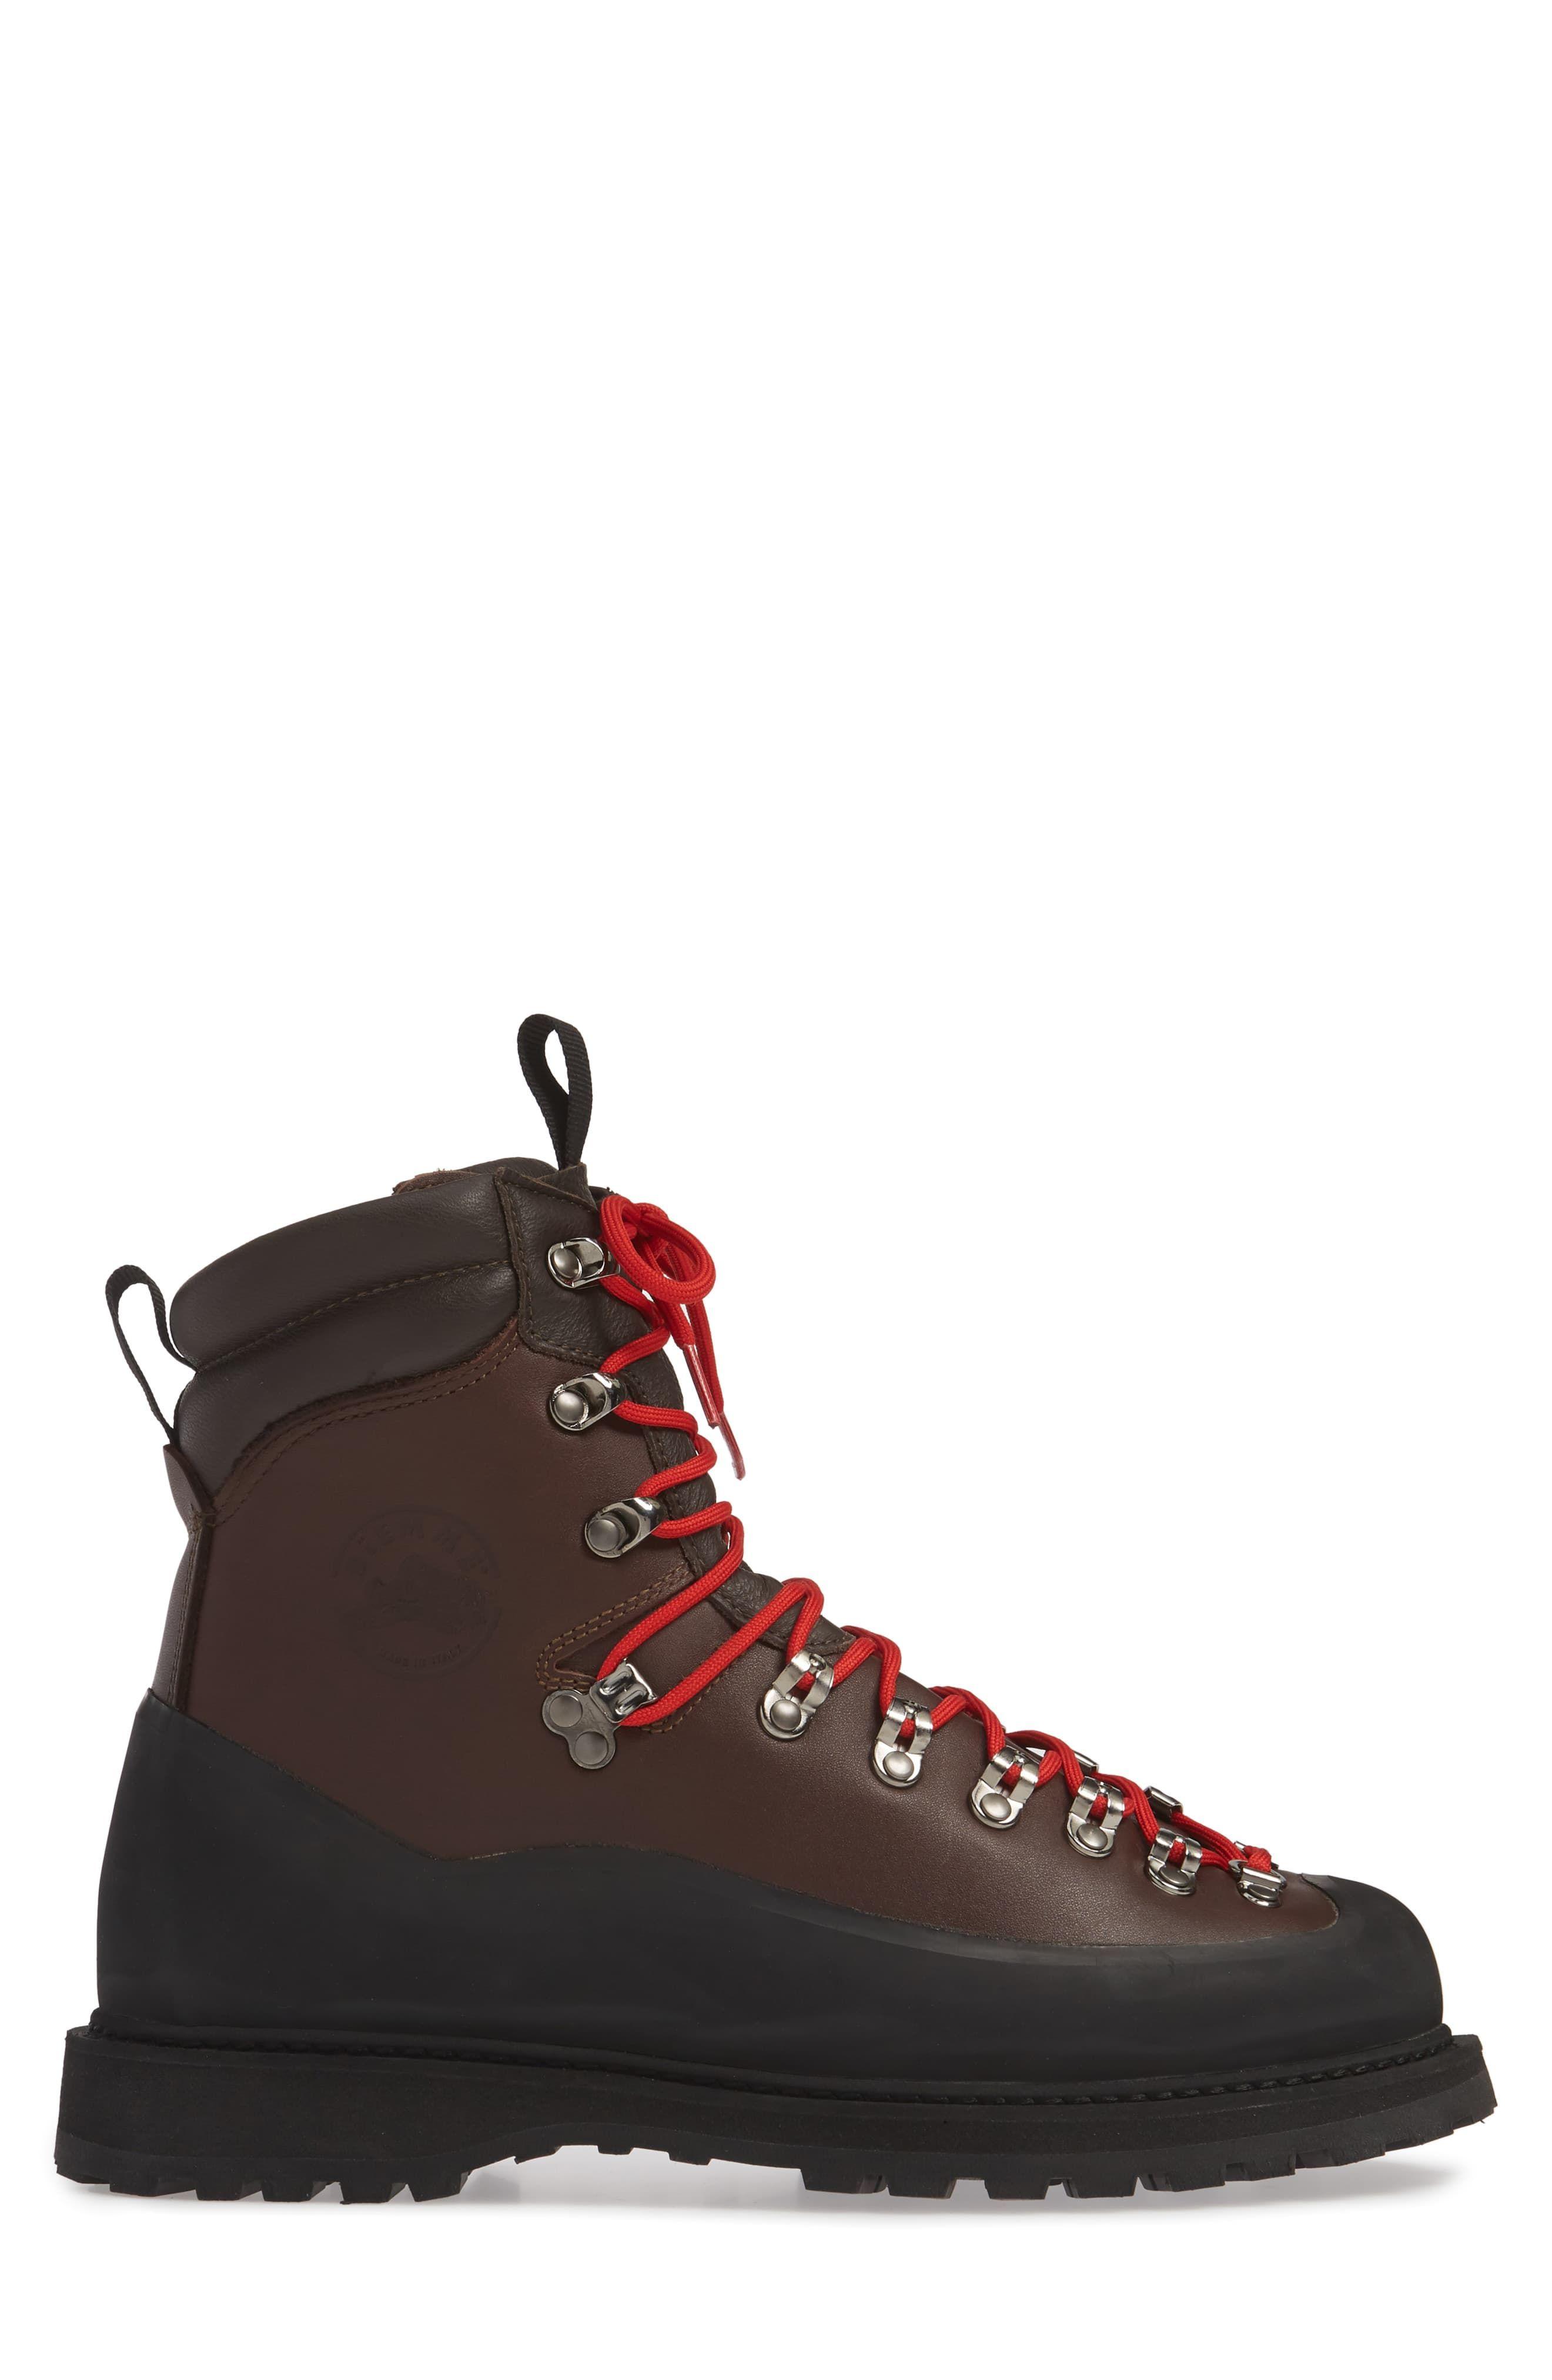 Adidas Terrex   Mens boots fashion, Hiking boots, Mens